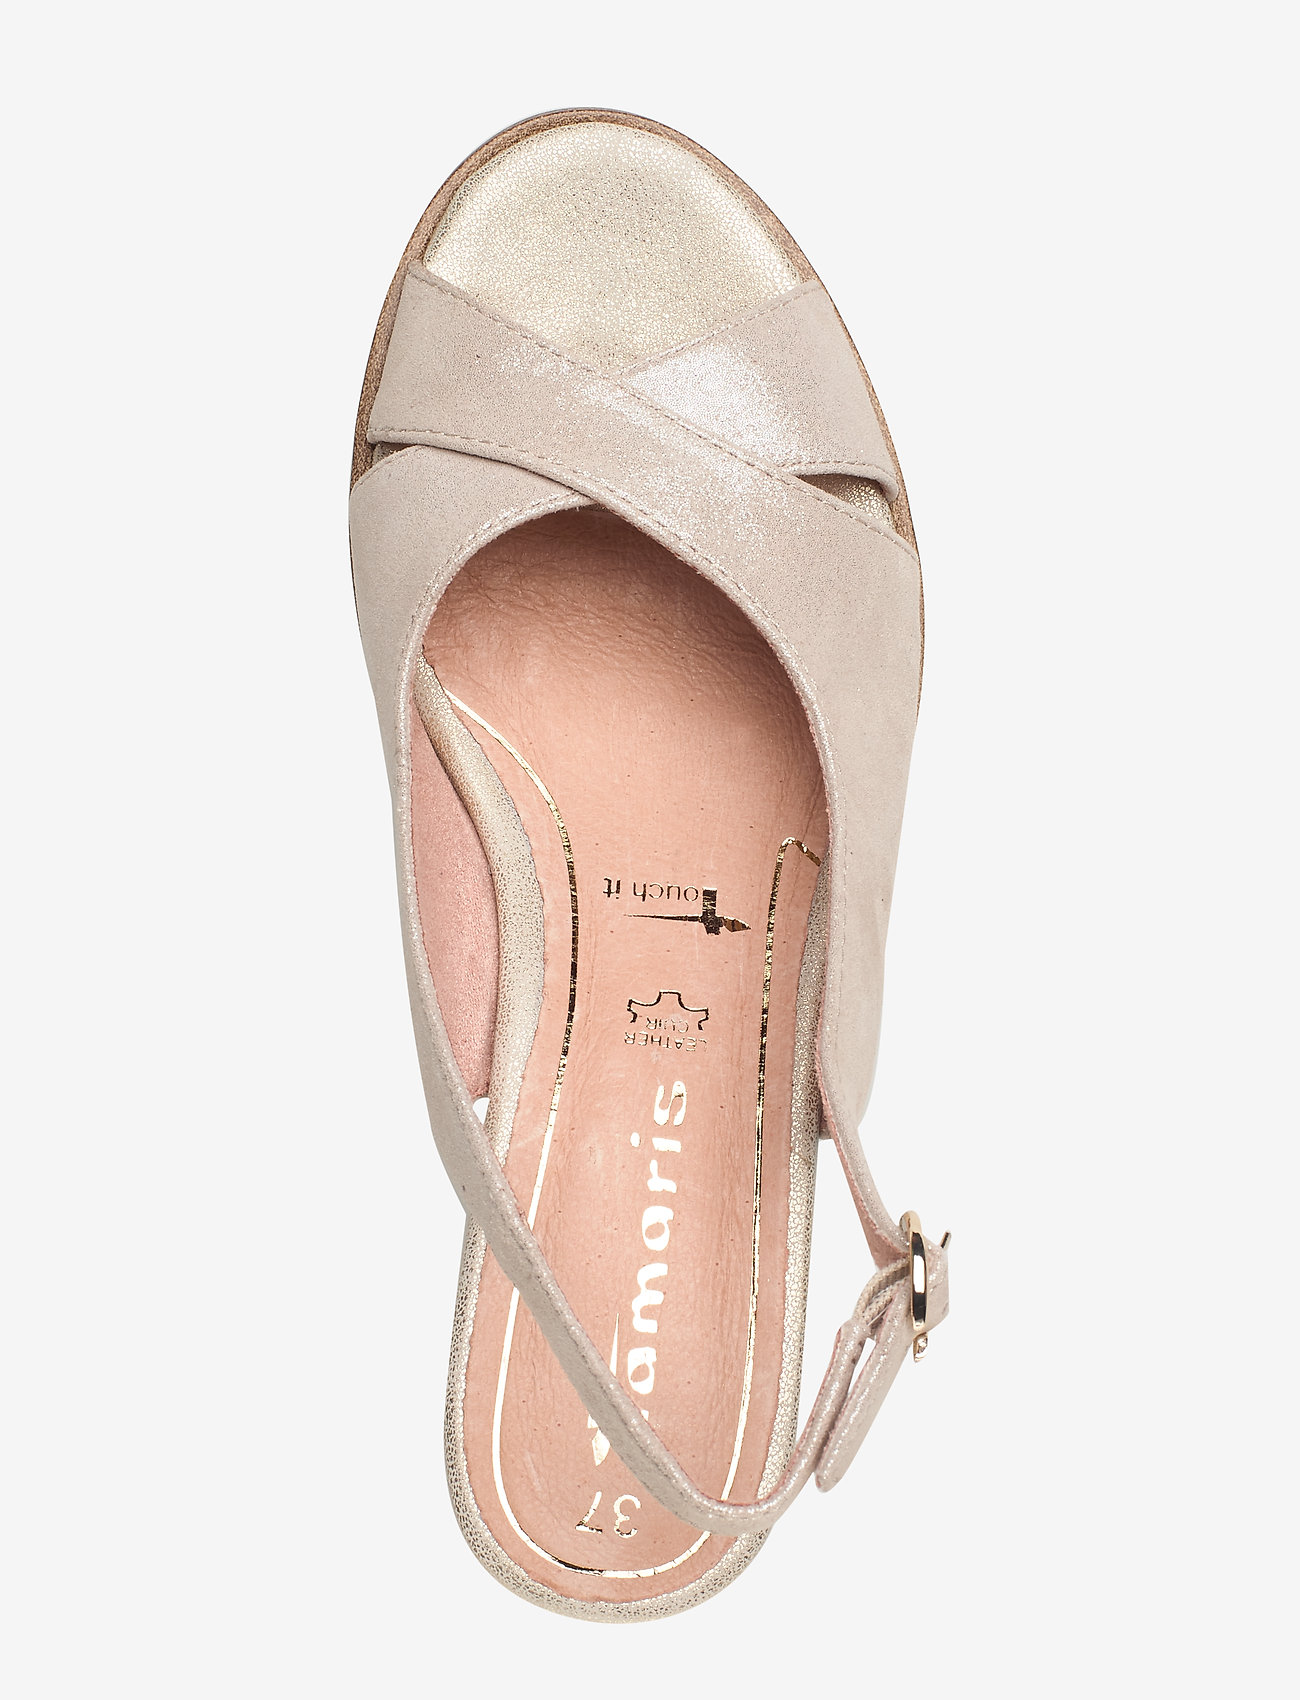 Woms Sandals (Champ. Pearl) (45.47 €) - Tamaris 2BlRu